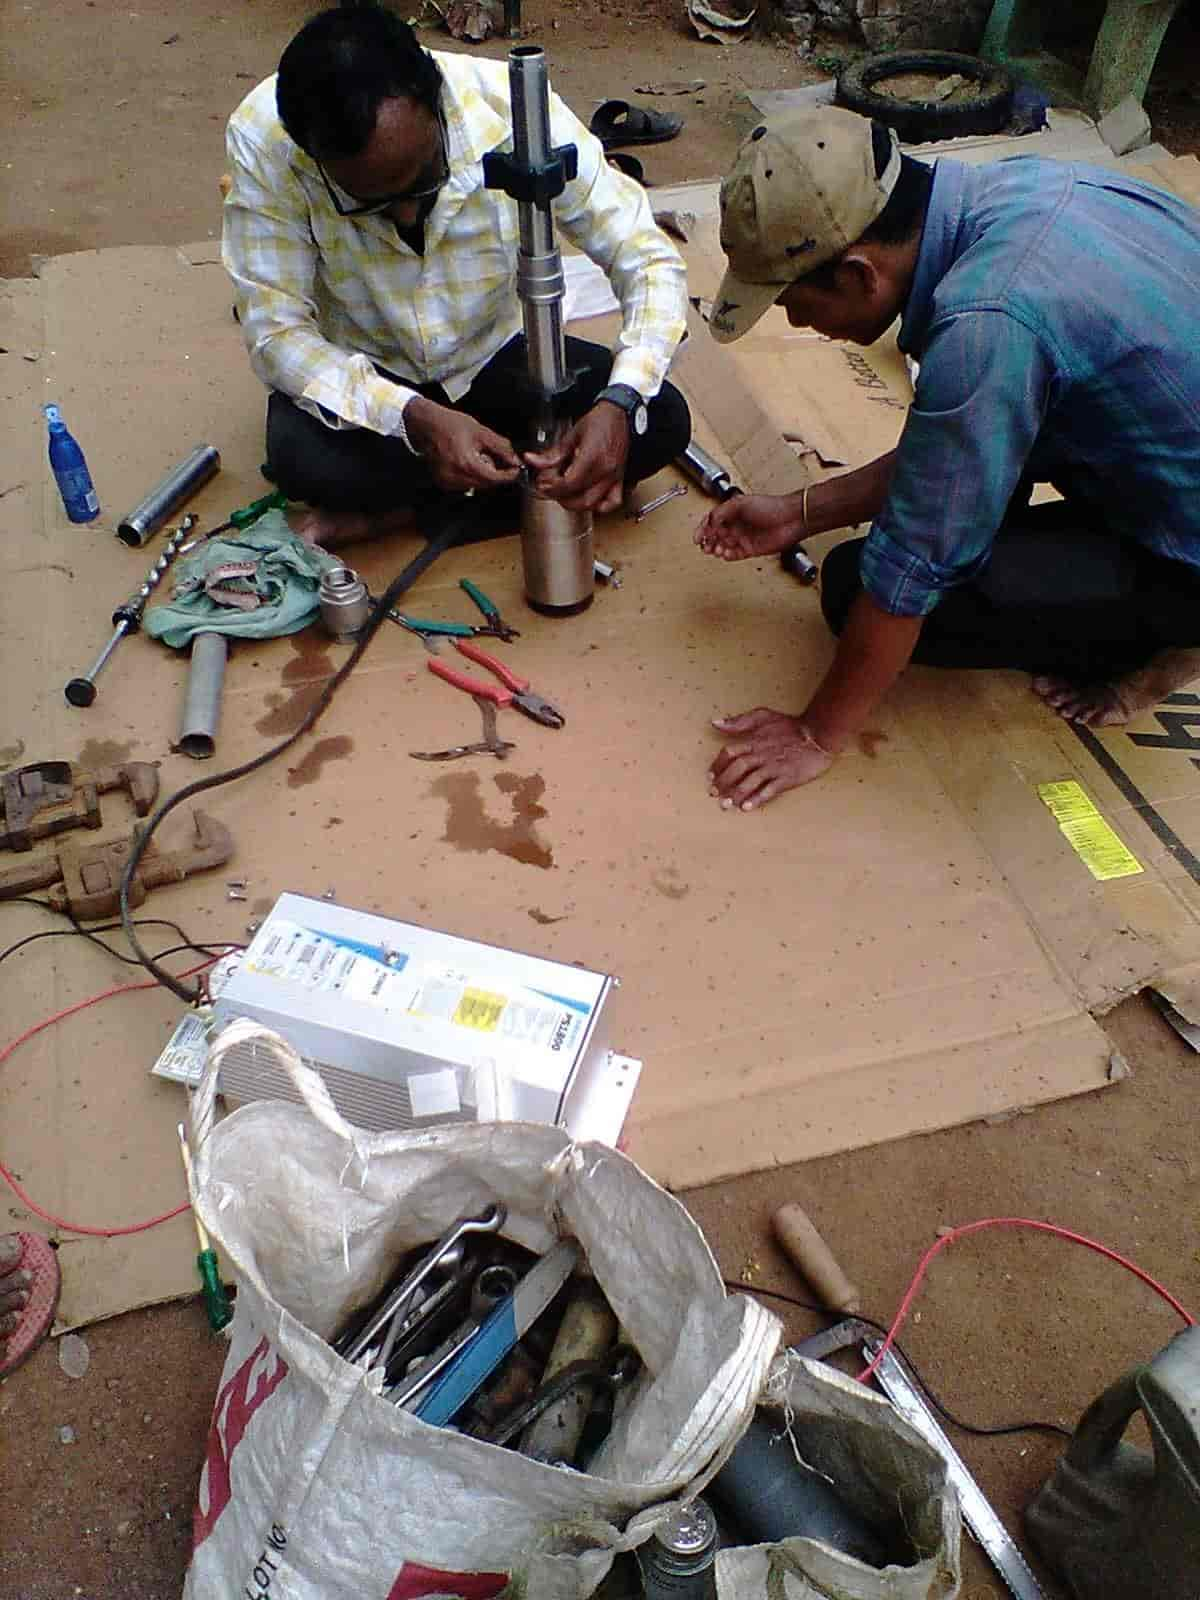 hight resolution of yazaki maraimalai nagar yazaki wiring technologies india pvt ltd see yazaki wiring technologies india pvt ltd car wire harness manufacturers in chennai